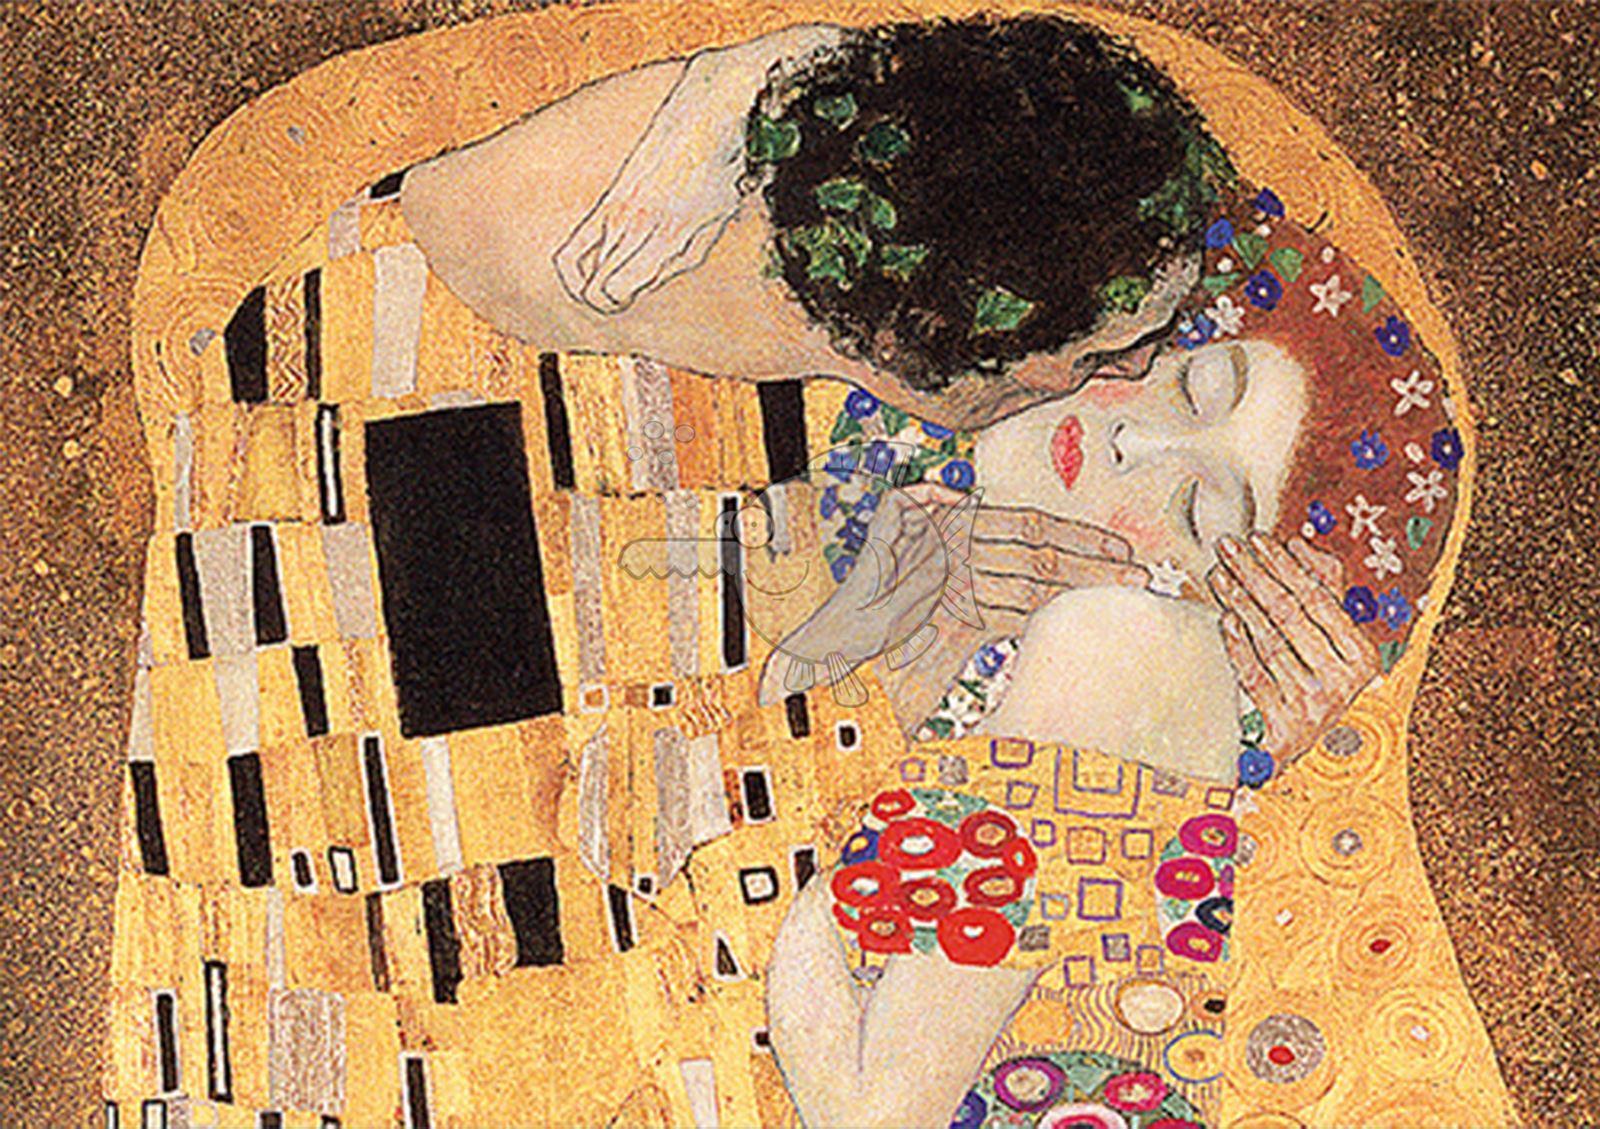 Trefl-300-500-1000-1500-2000-3000-4000-6000-Piece-Jigsaw-Puzzle-Landscapes-City thumbnail 393